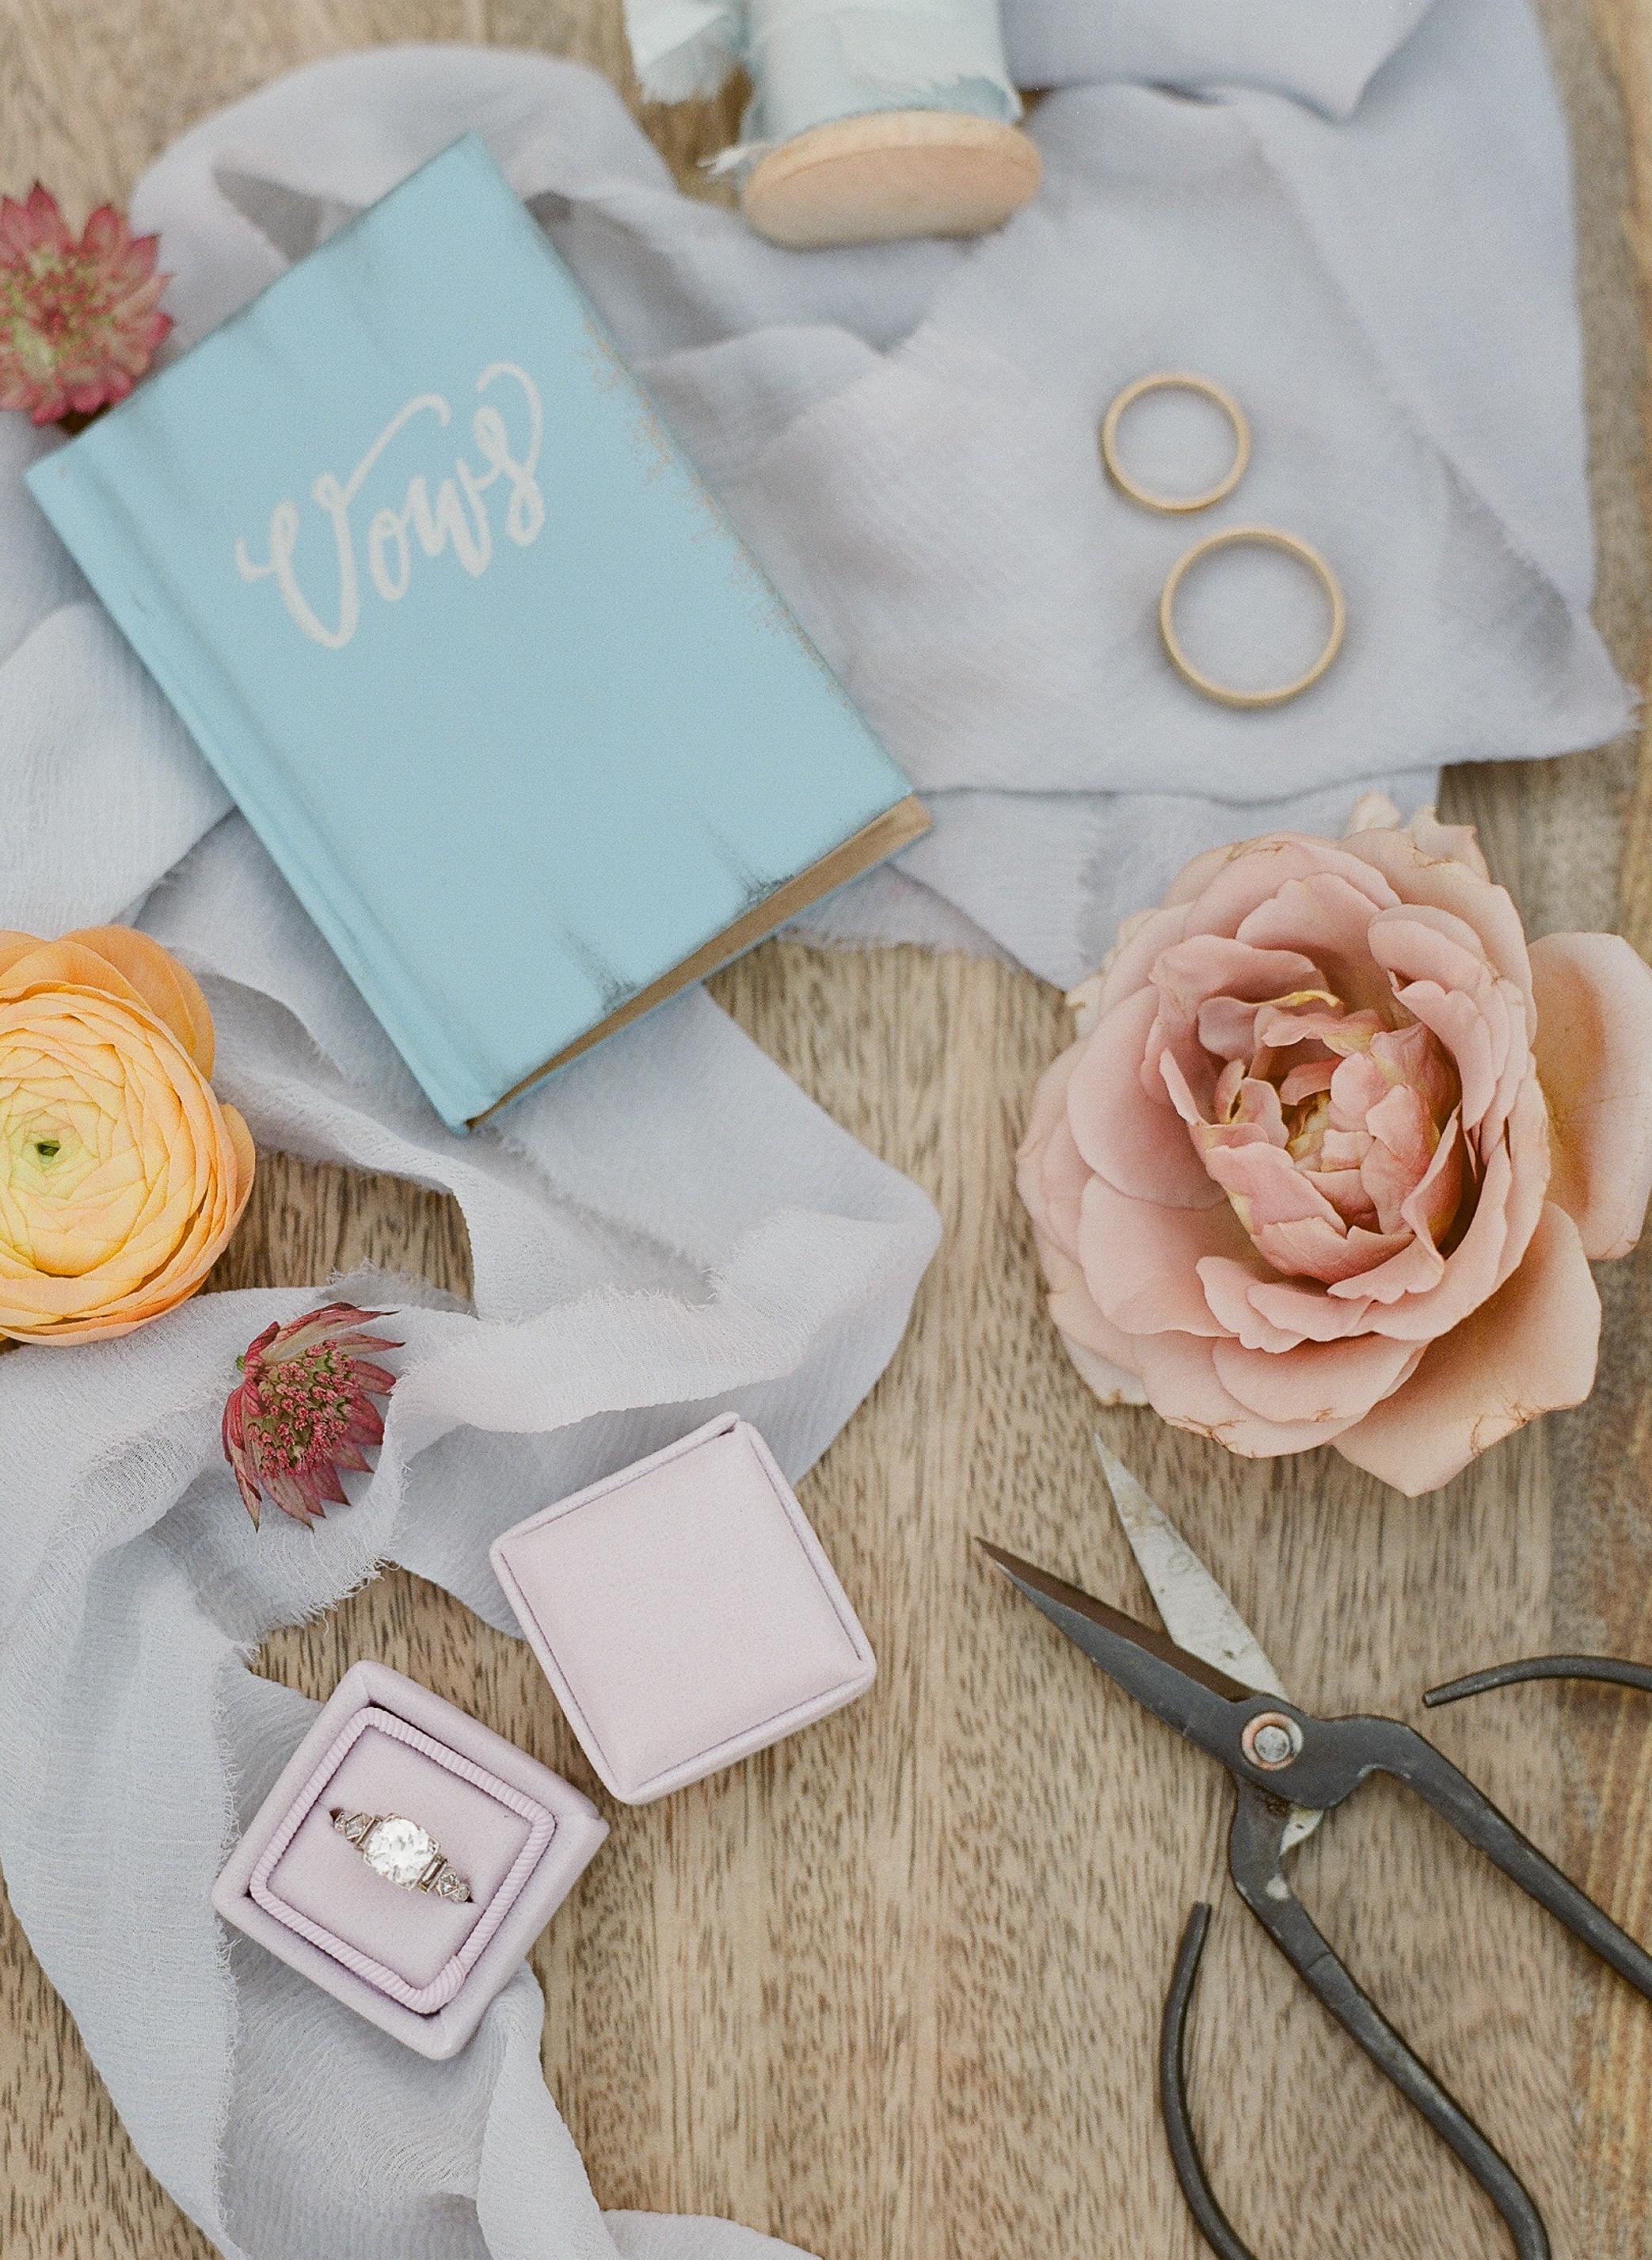 santa-barbara-elopement-elope-wedding-planner-planning-coordinator-day-of-intimate-event-design-kestrel-park-santa-ynez-english-country-estate-garden-castle (5).jpg